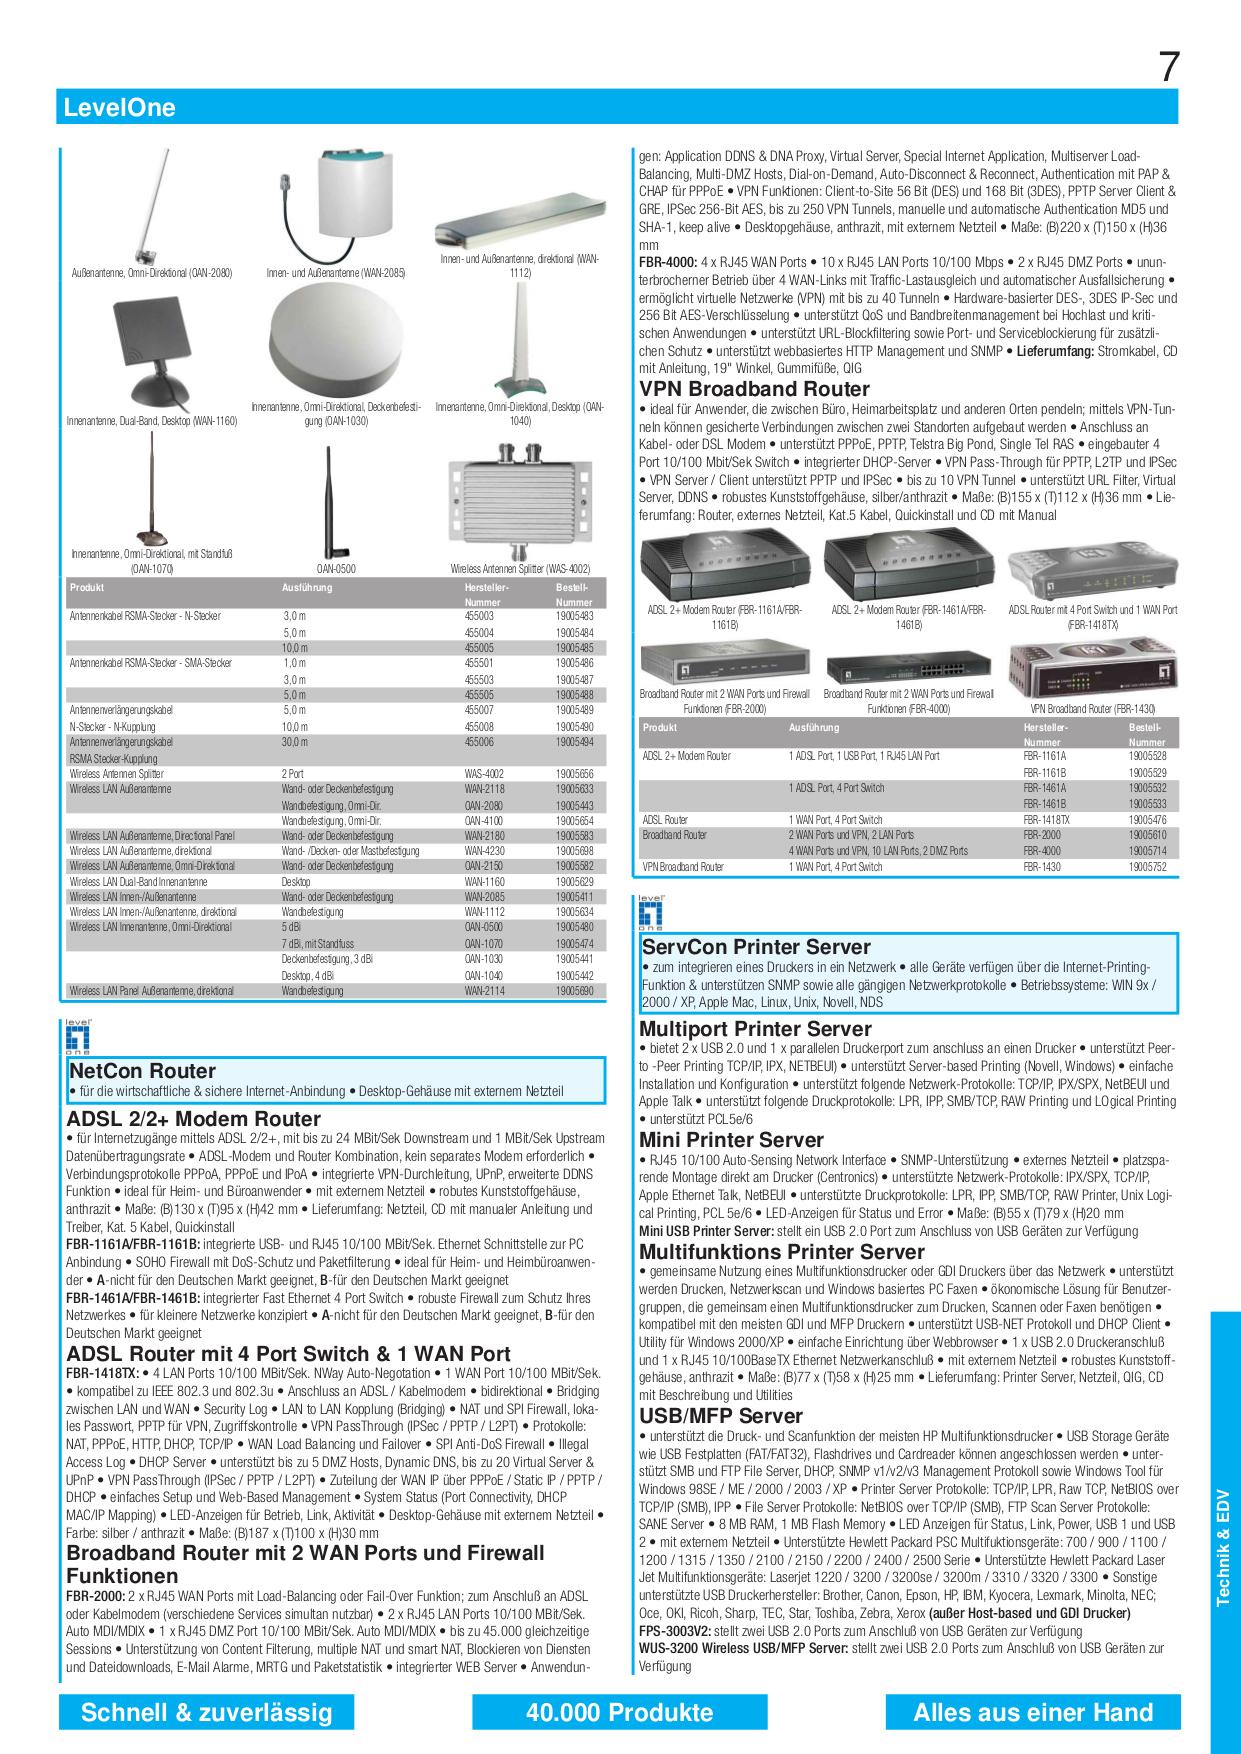 vip 3.0 manual pdf